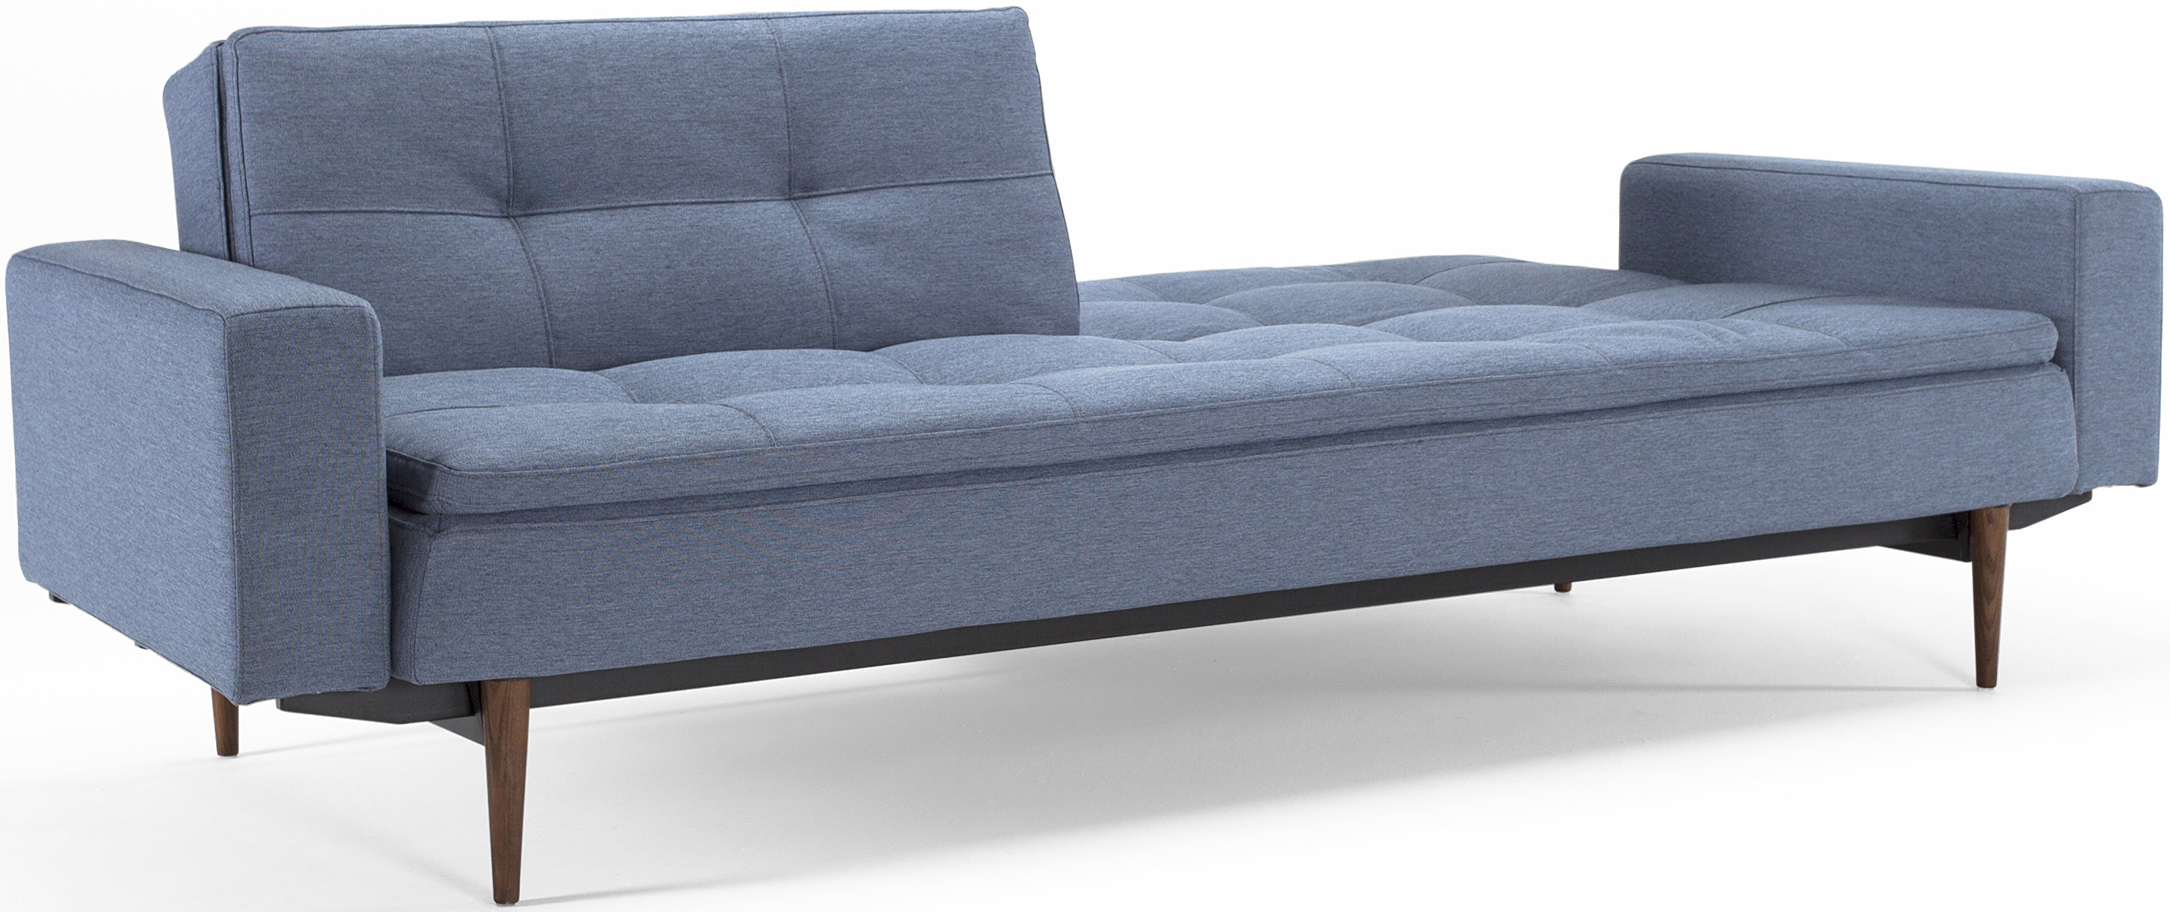 innovation dublexo sofa